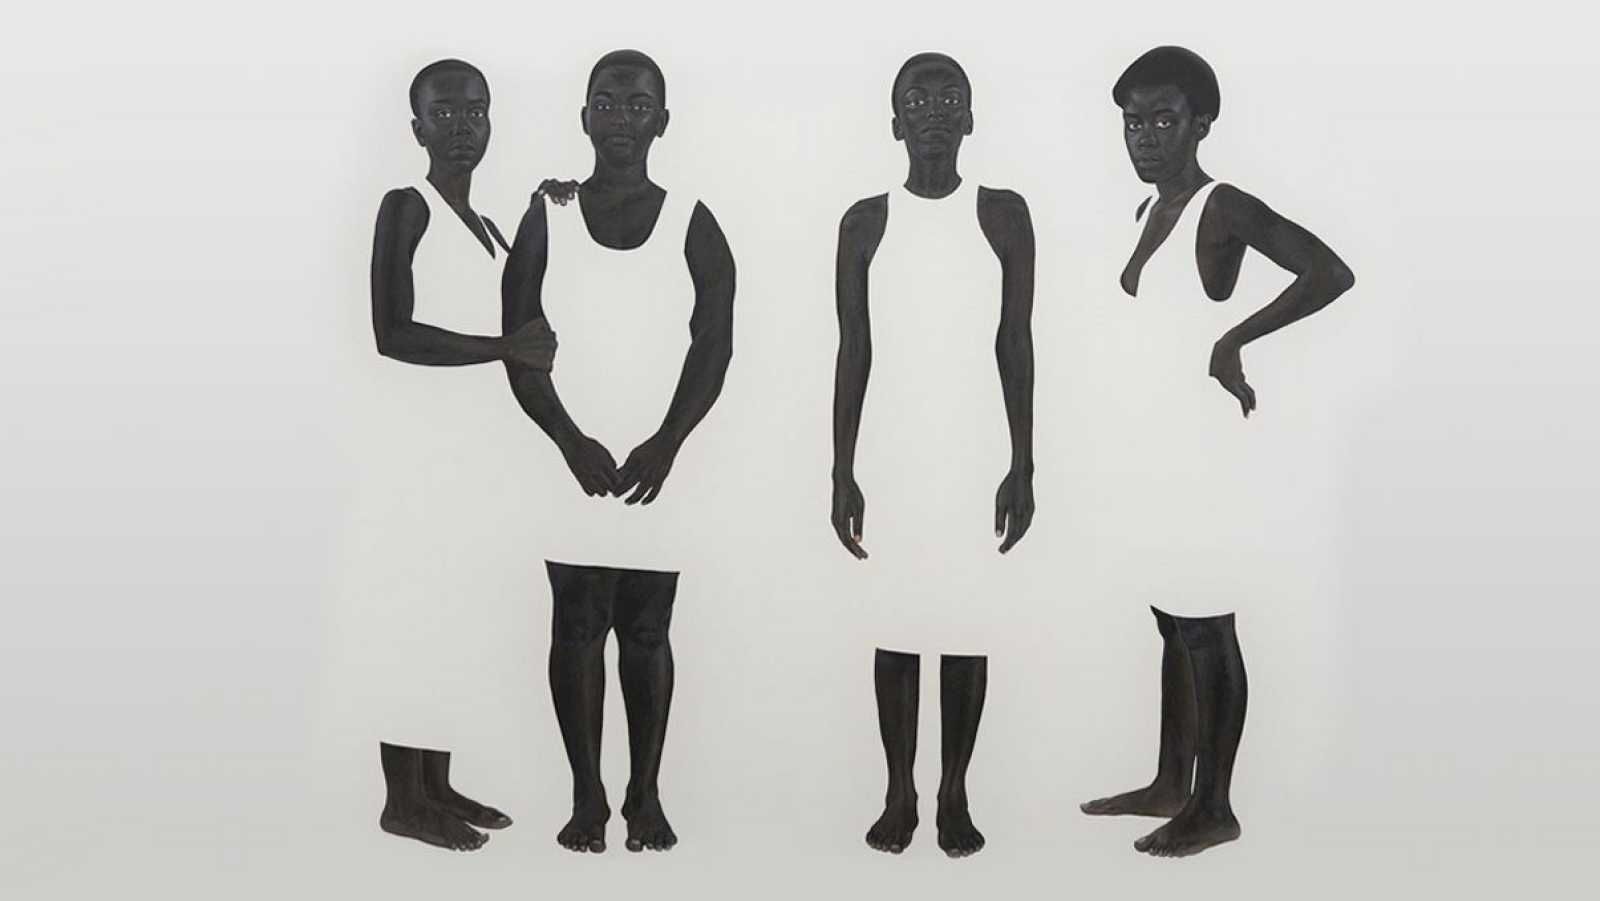 África hoy - Wiriko, una ventana cultural africana - 22/09/20 - escuchar ahora